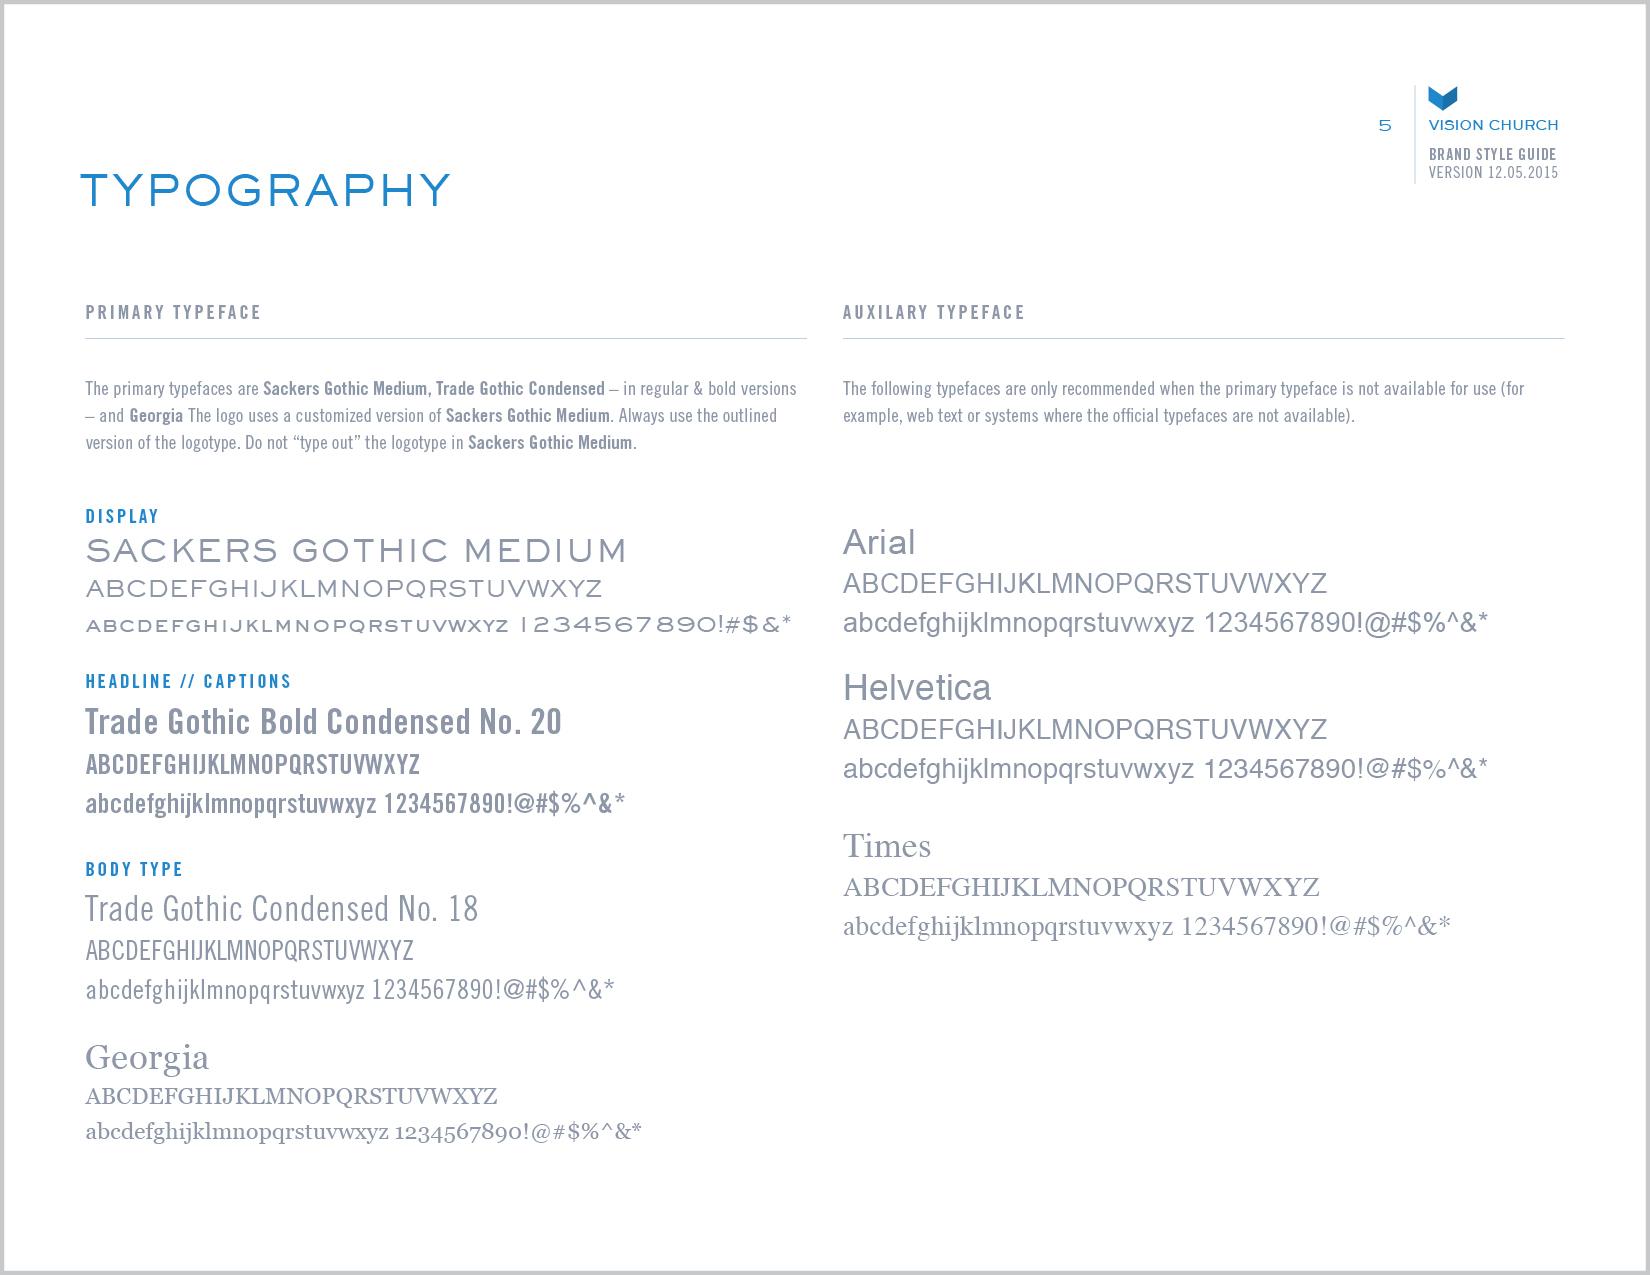 VISION_RDU-BrandStyleGuide5.jpg